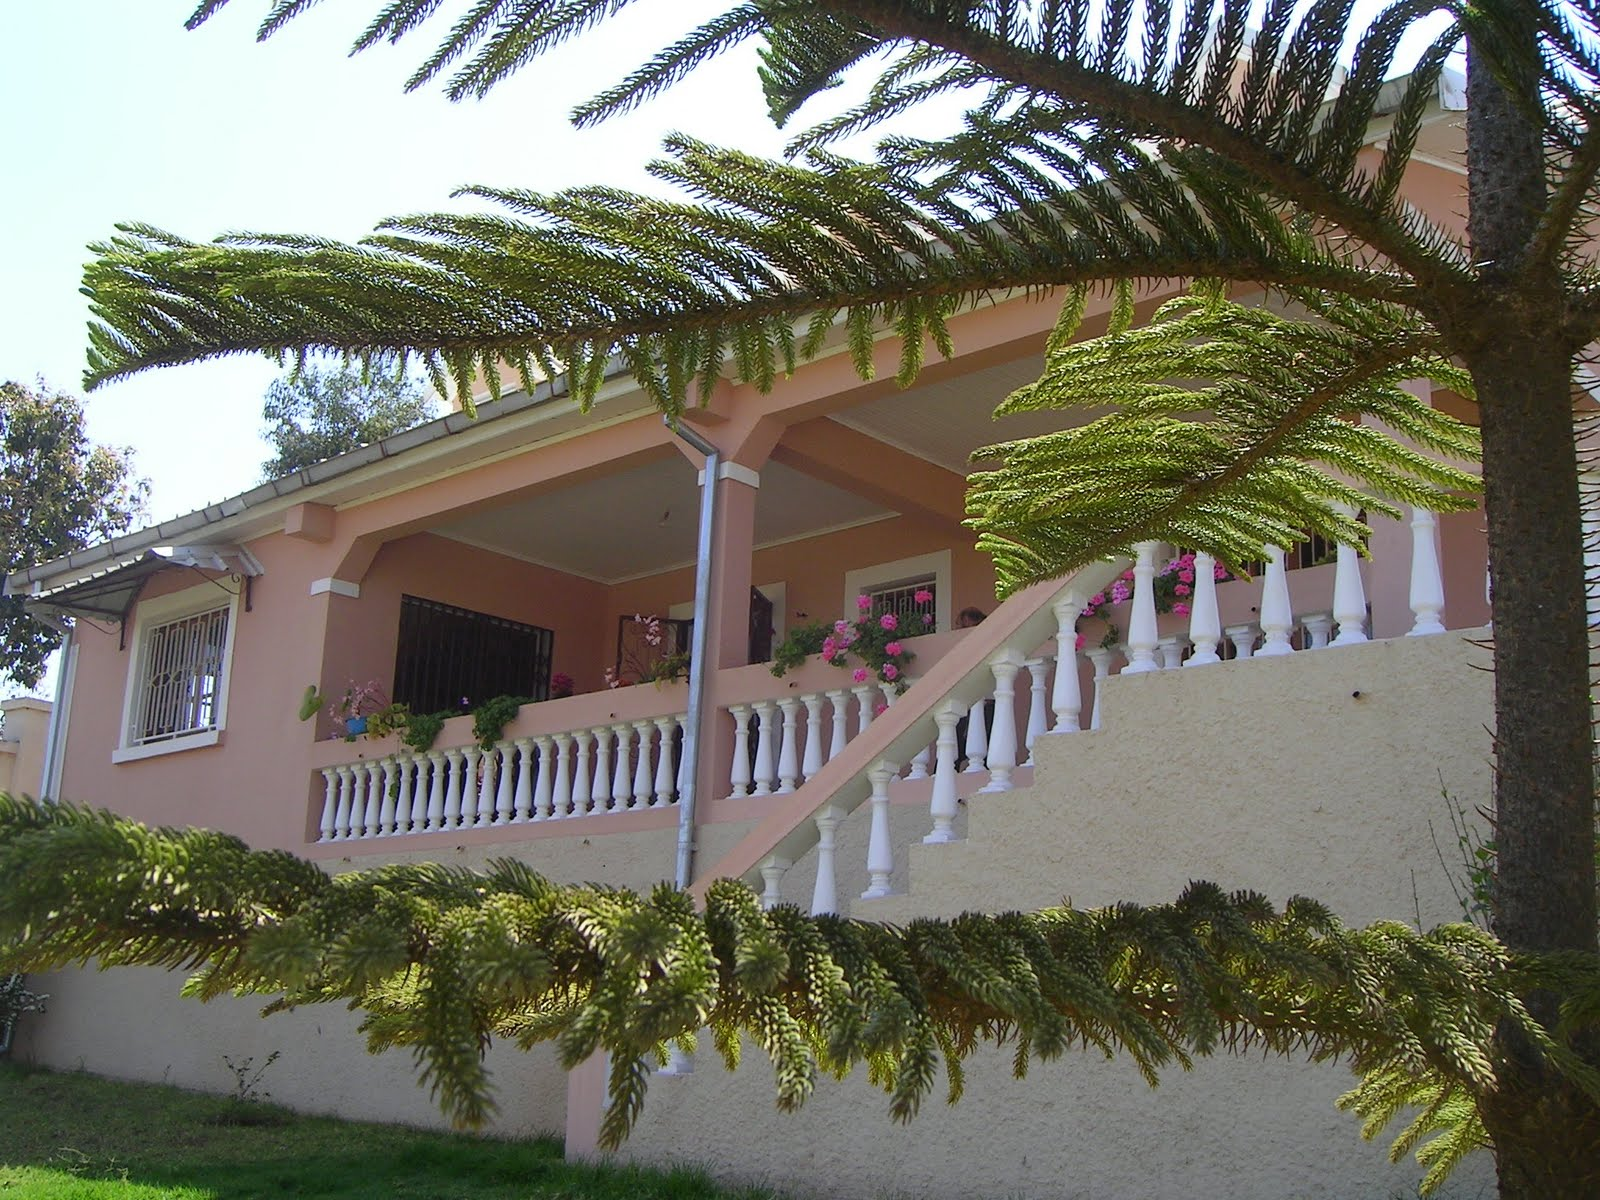 Maison Neuve A Tana